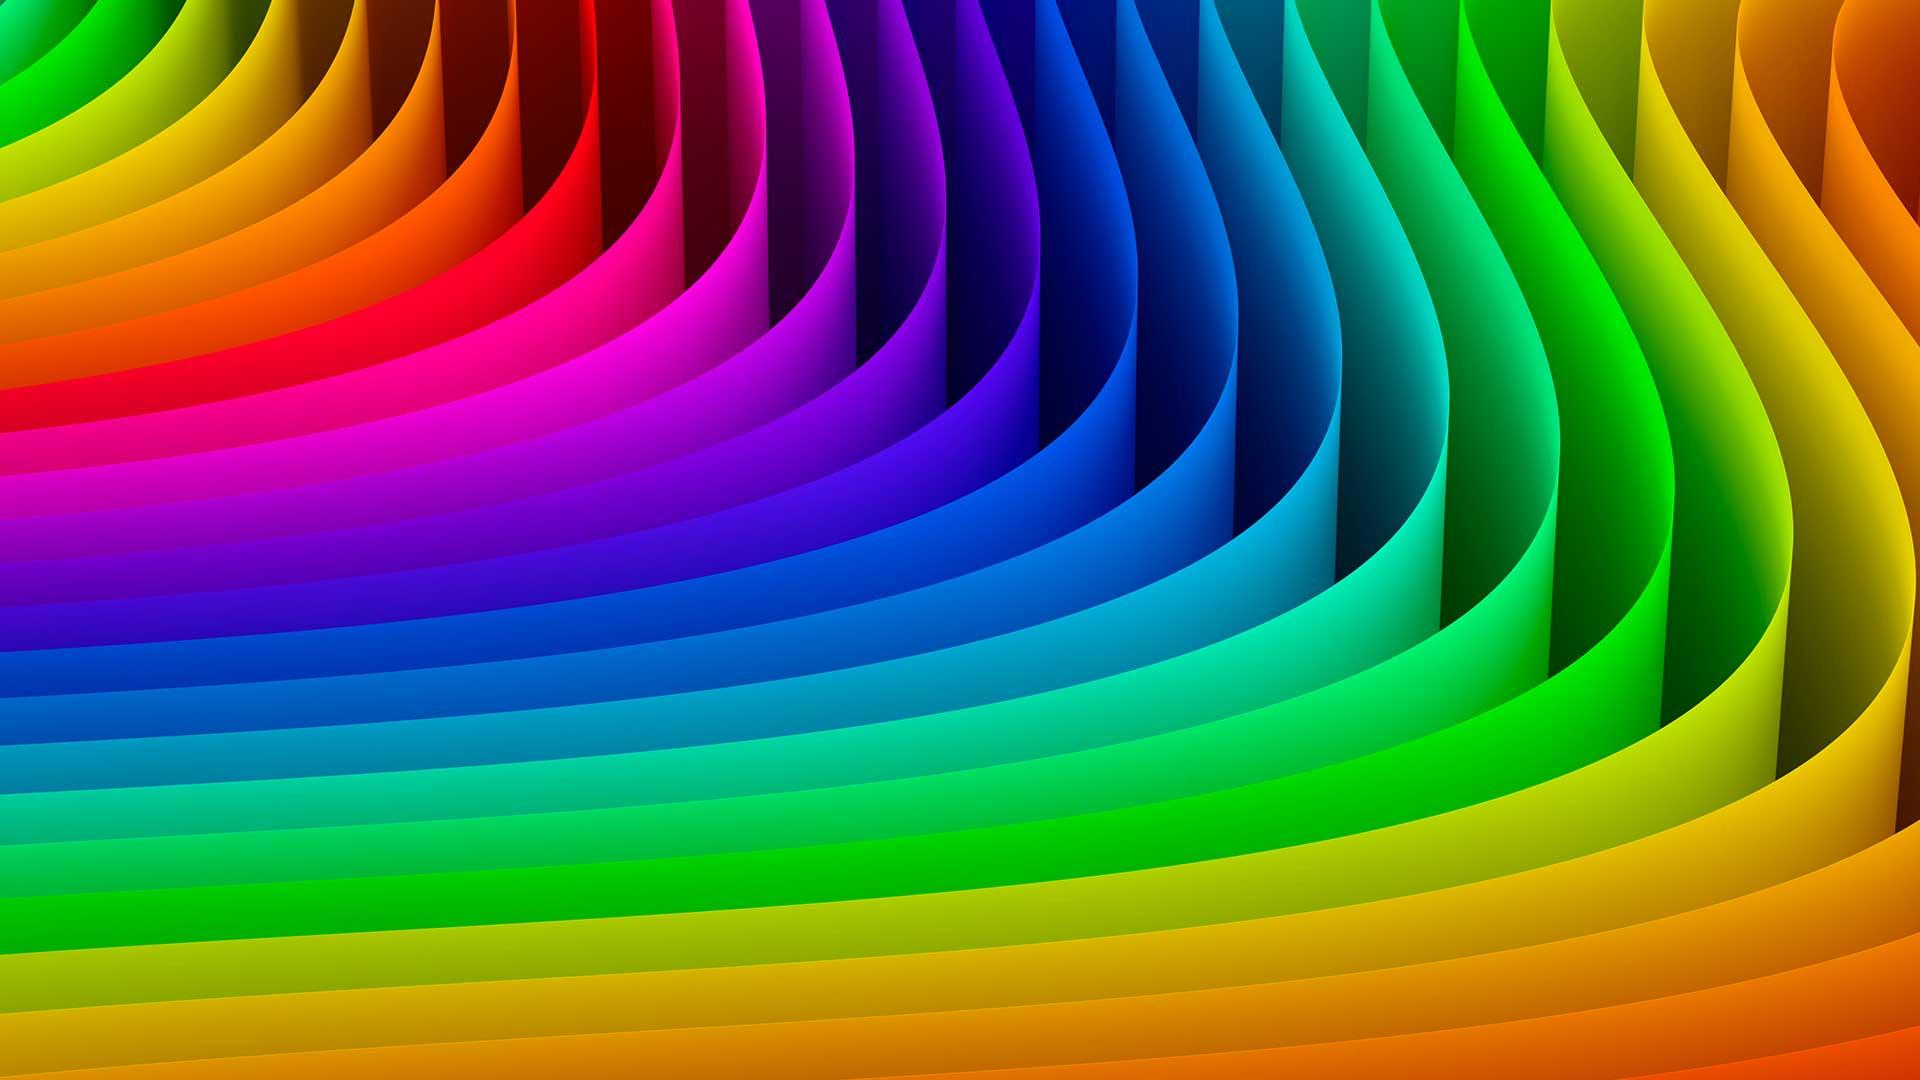 Hangi Renk Zengin Gösterir?